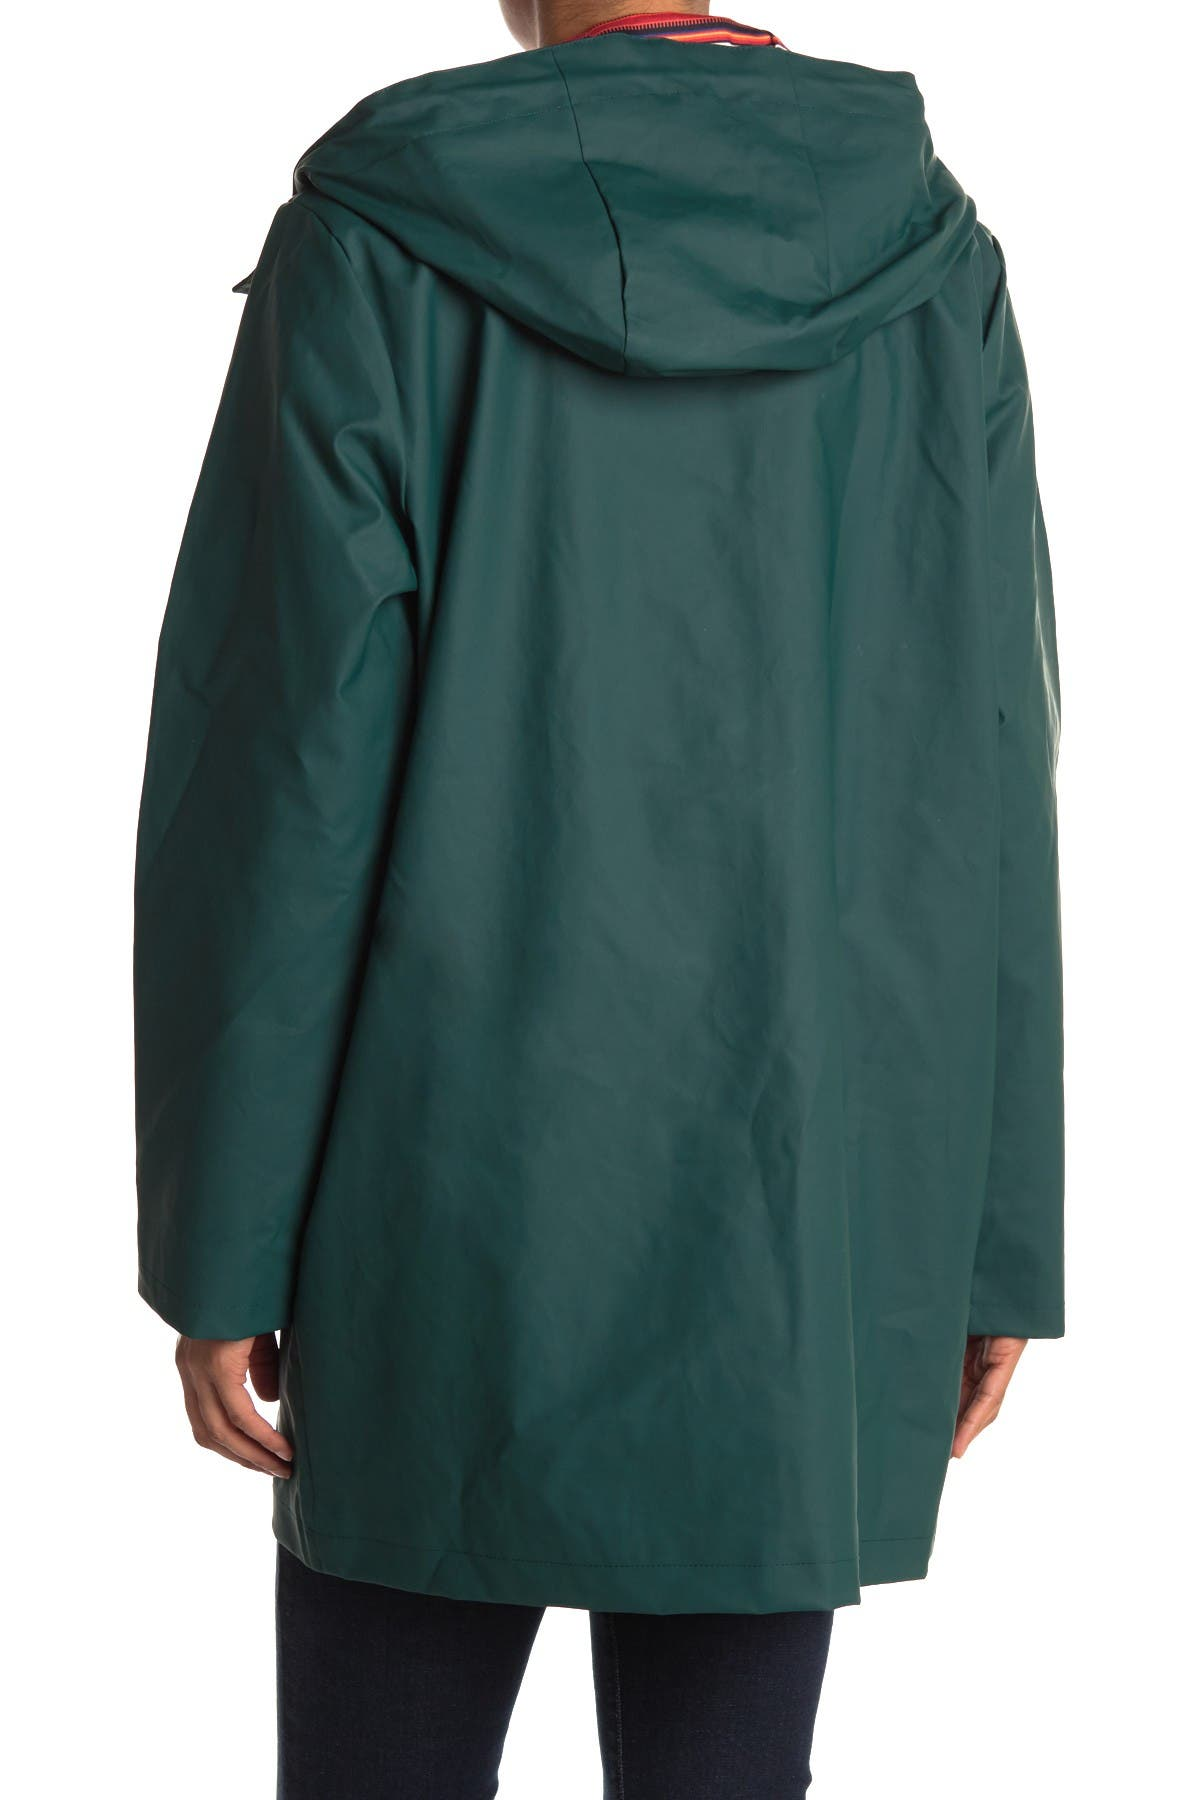 Image of PENDLETON Olympic Hooded Slicker Jacket